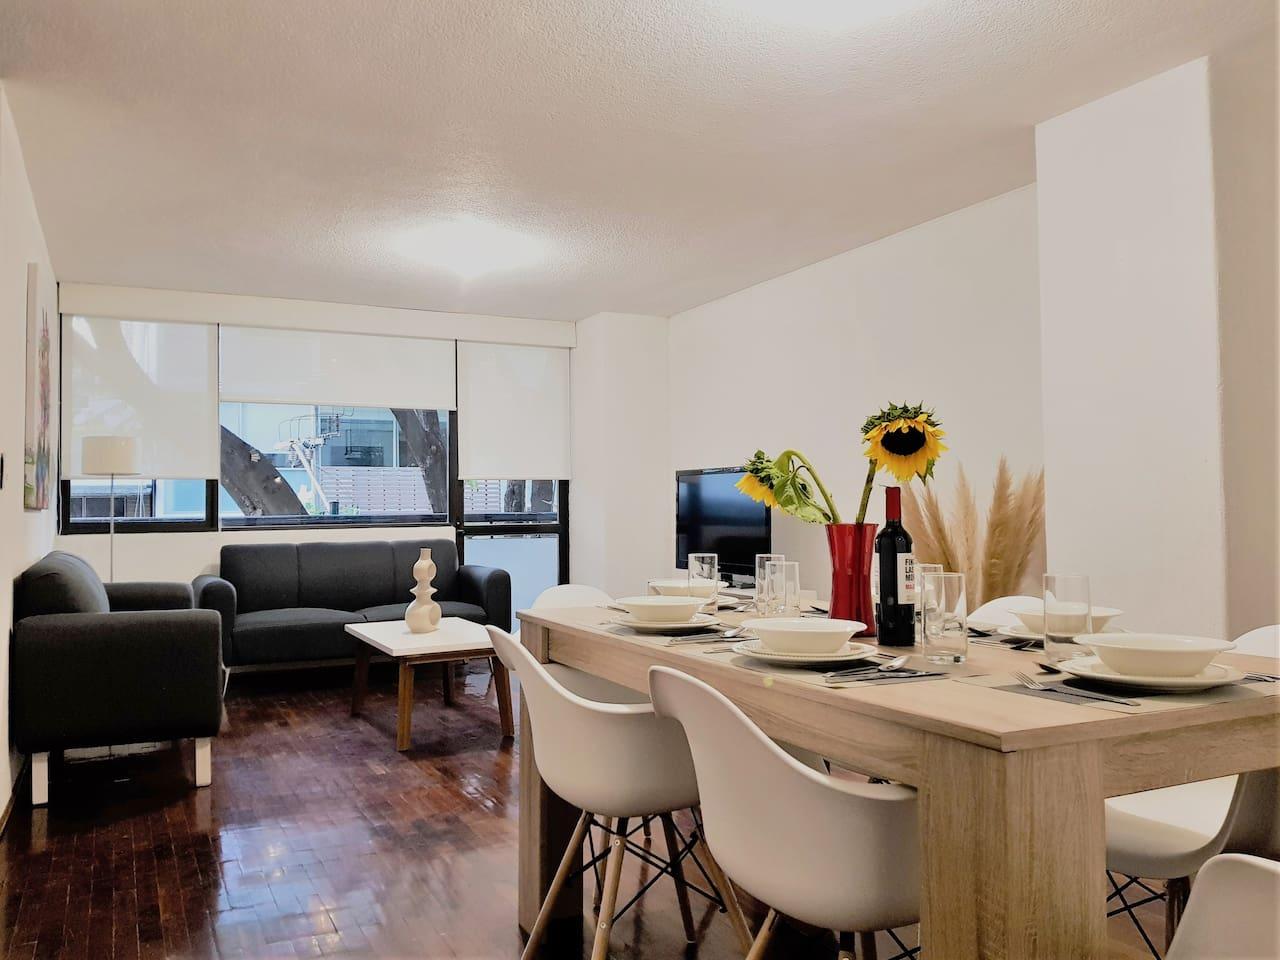 Cozy Apartment with exterior balcony 124m2 (1334sq ft)